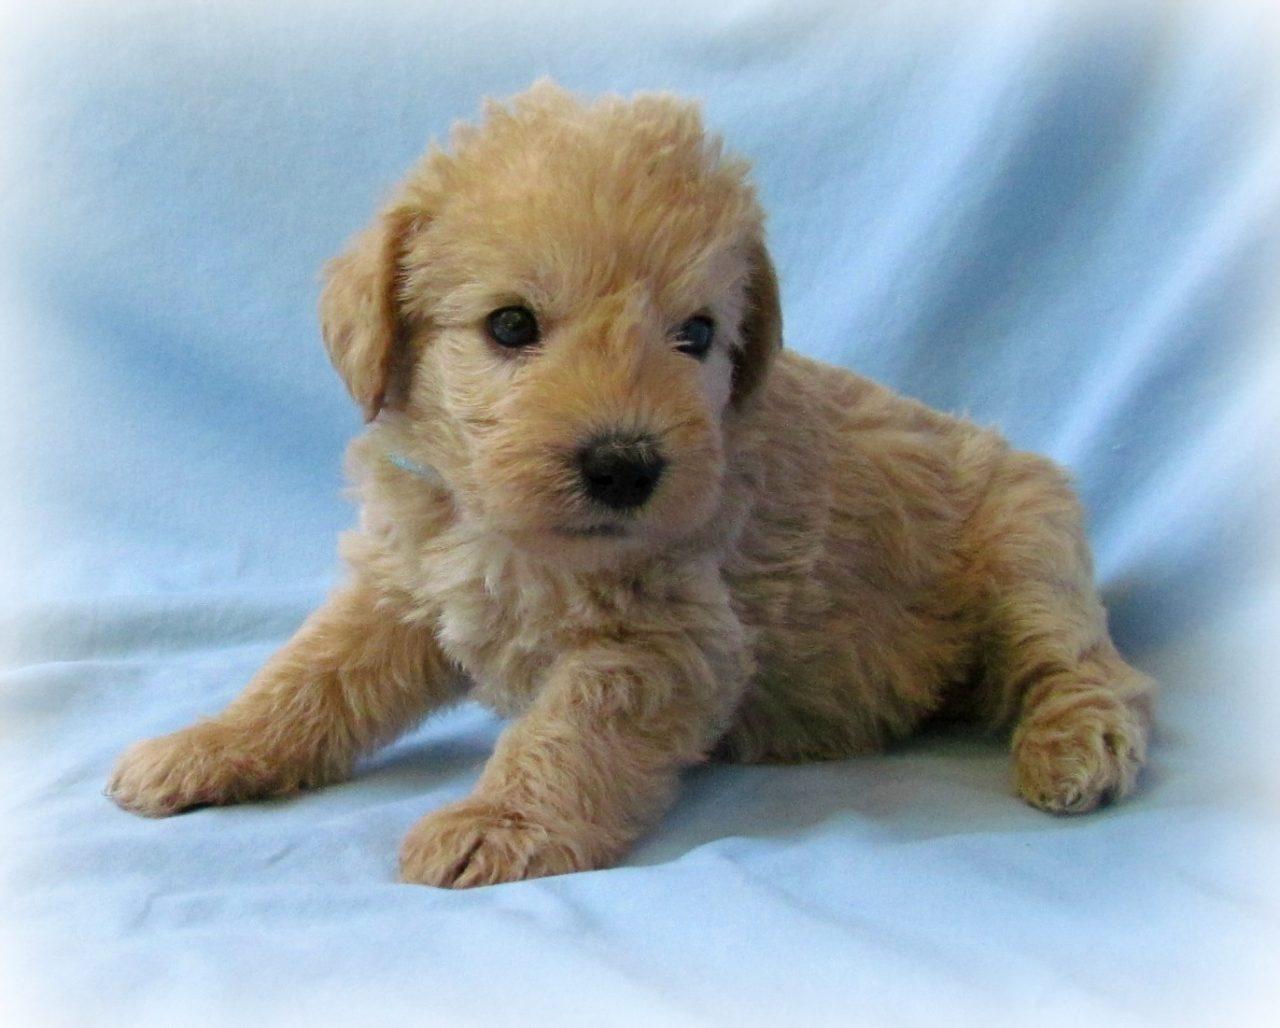 The Miniature Poodle